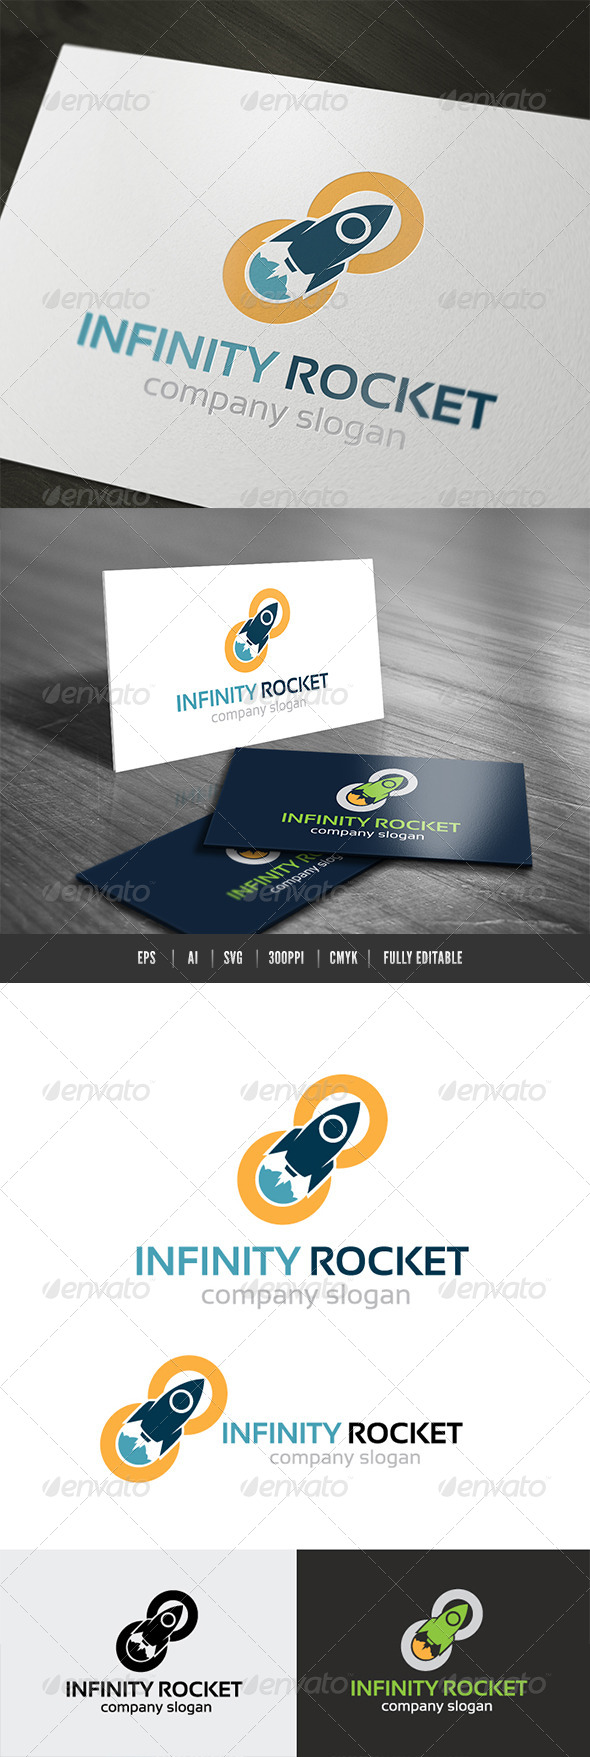 Infinity Rocket Logo